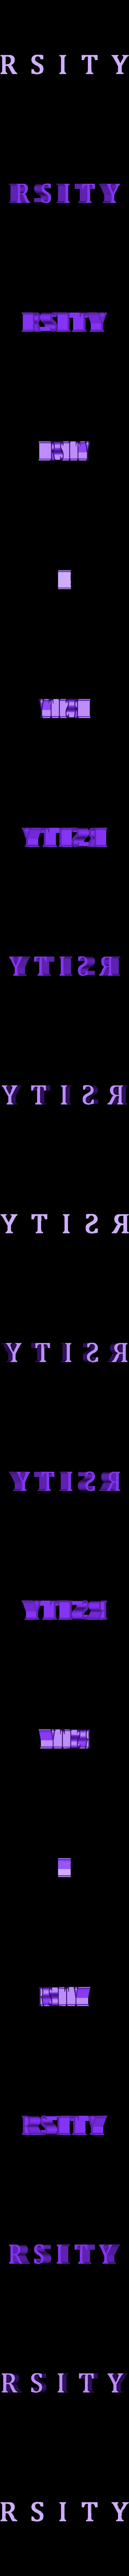 Break_RSITY_01.stl Download free STL file The Magicians - Brakebills University Logo • 3D printing template, SYFY